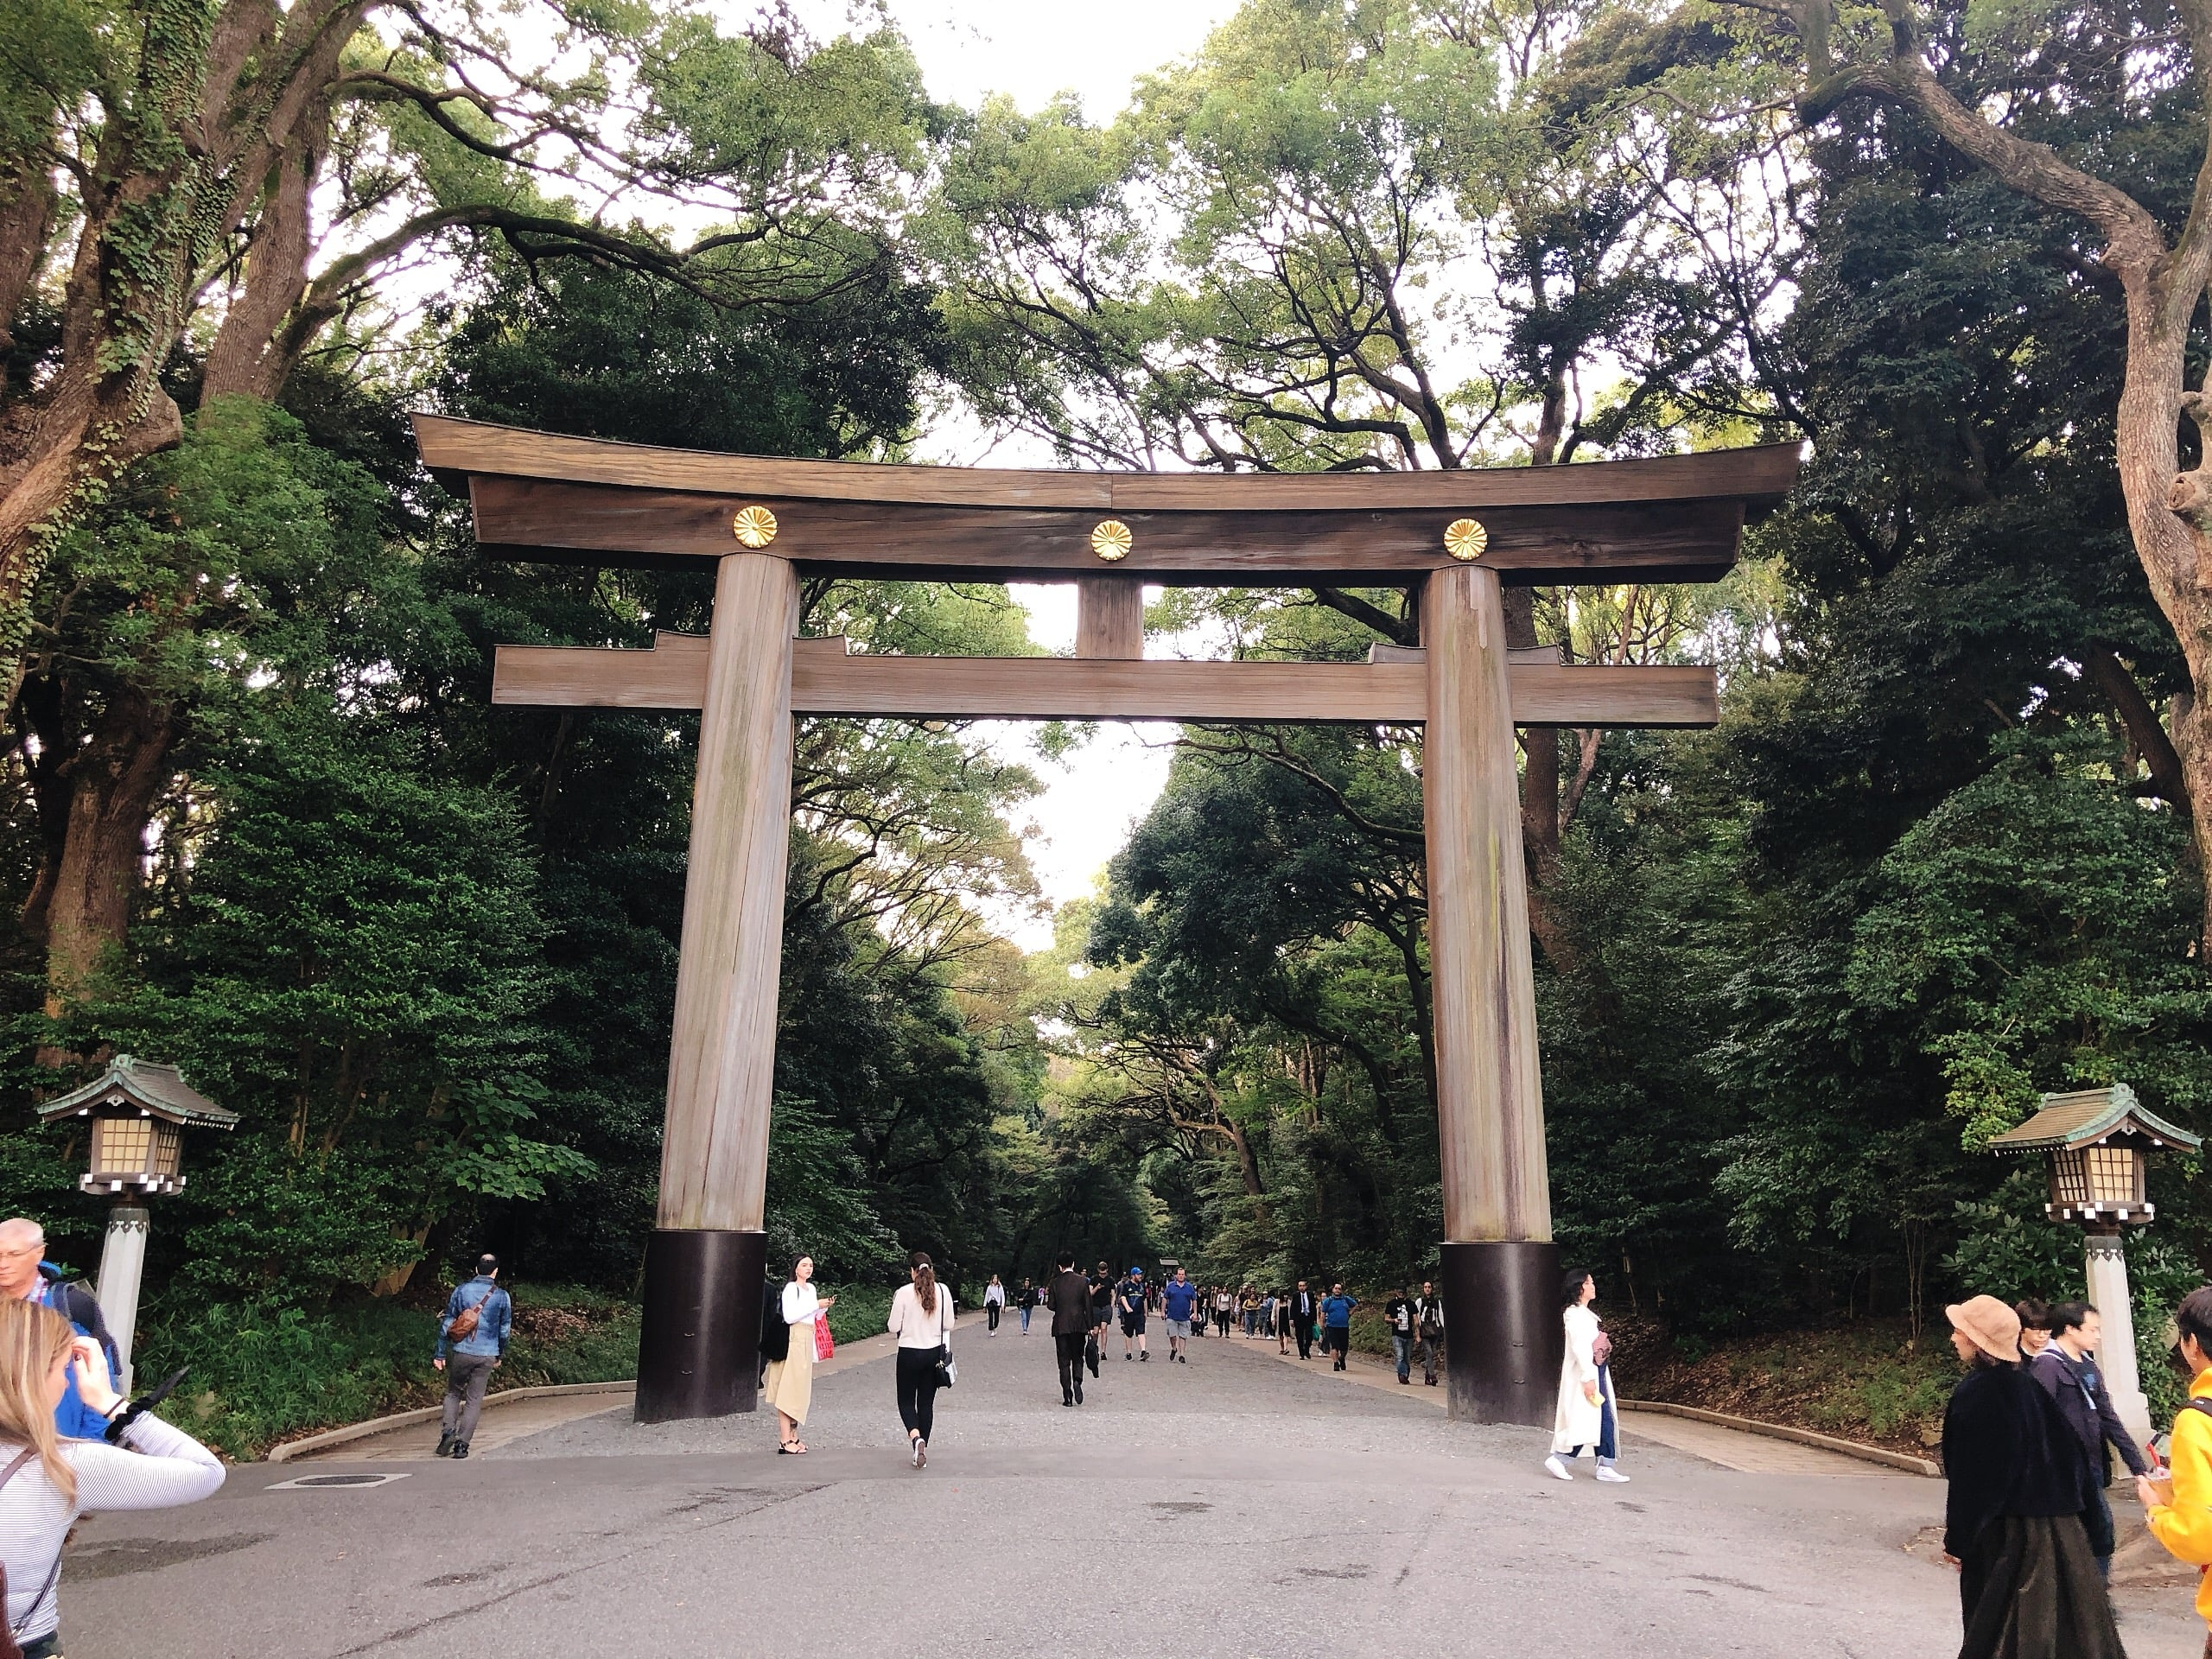 The torii gate of Meiji Shrine